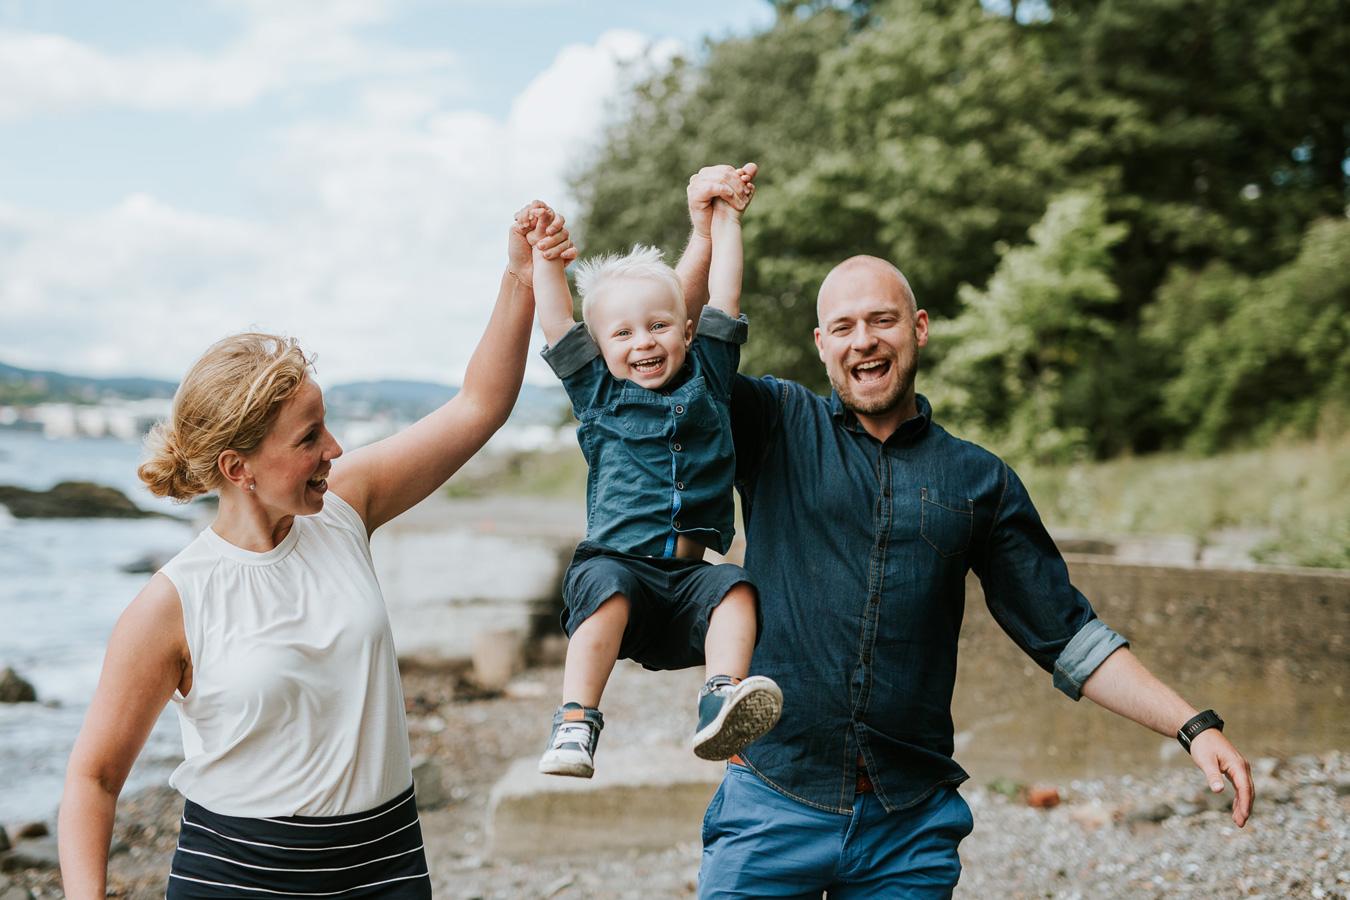 005-Familiefotografering-fotograf-oslo.jpg